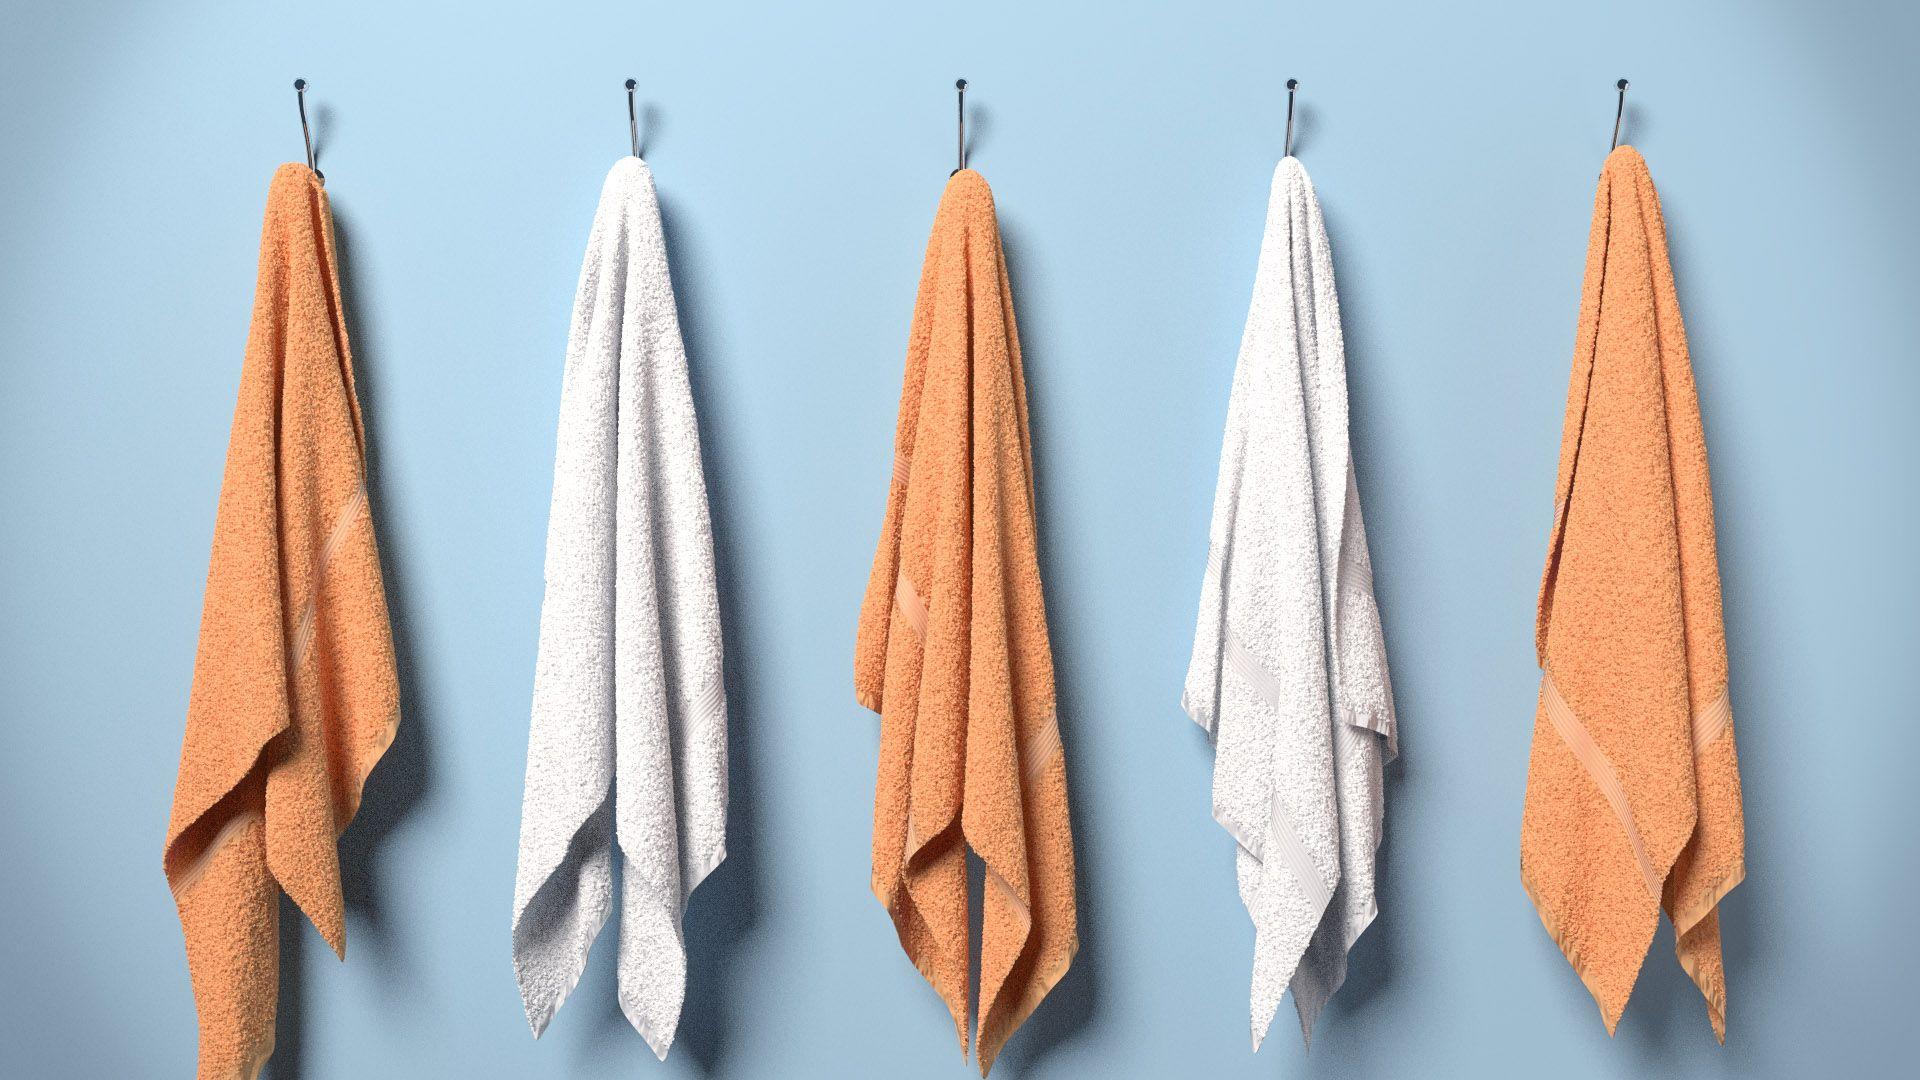 hanging towel. Blender Fabric Tutorial: How To Make Towels Hanging Towel B